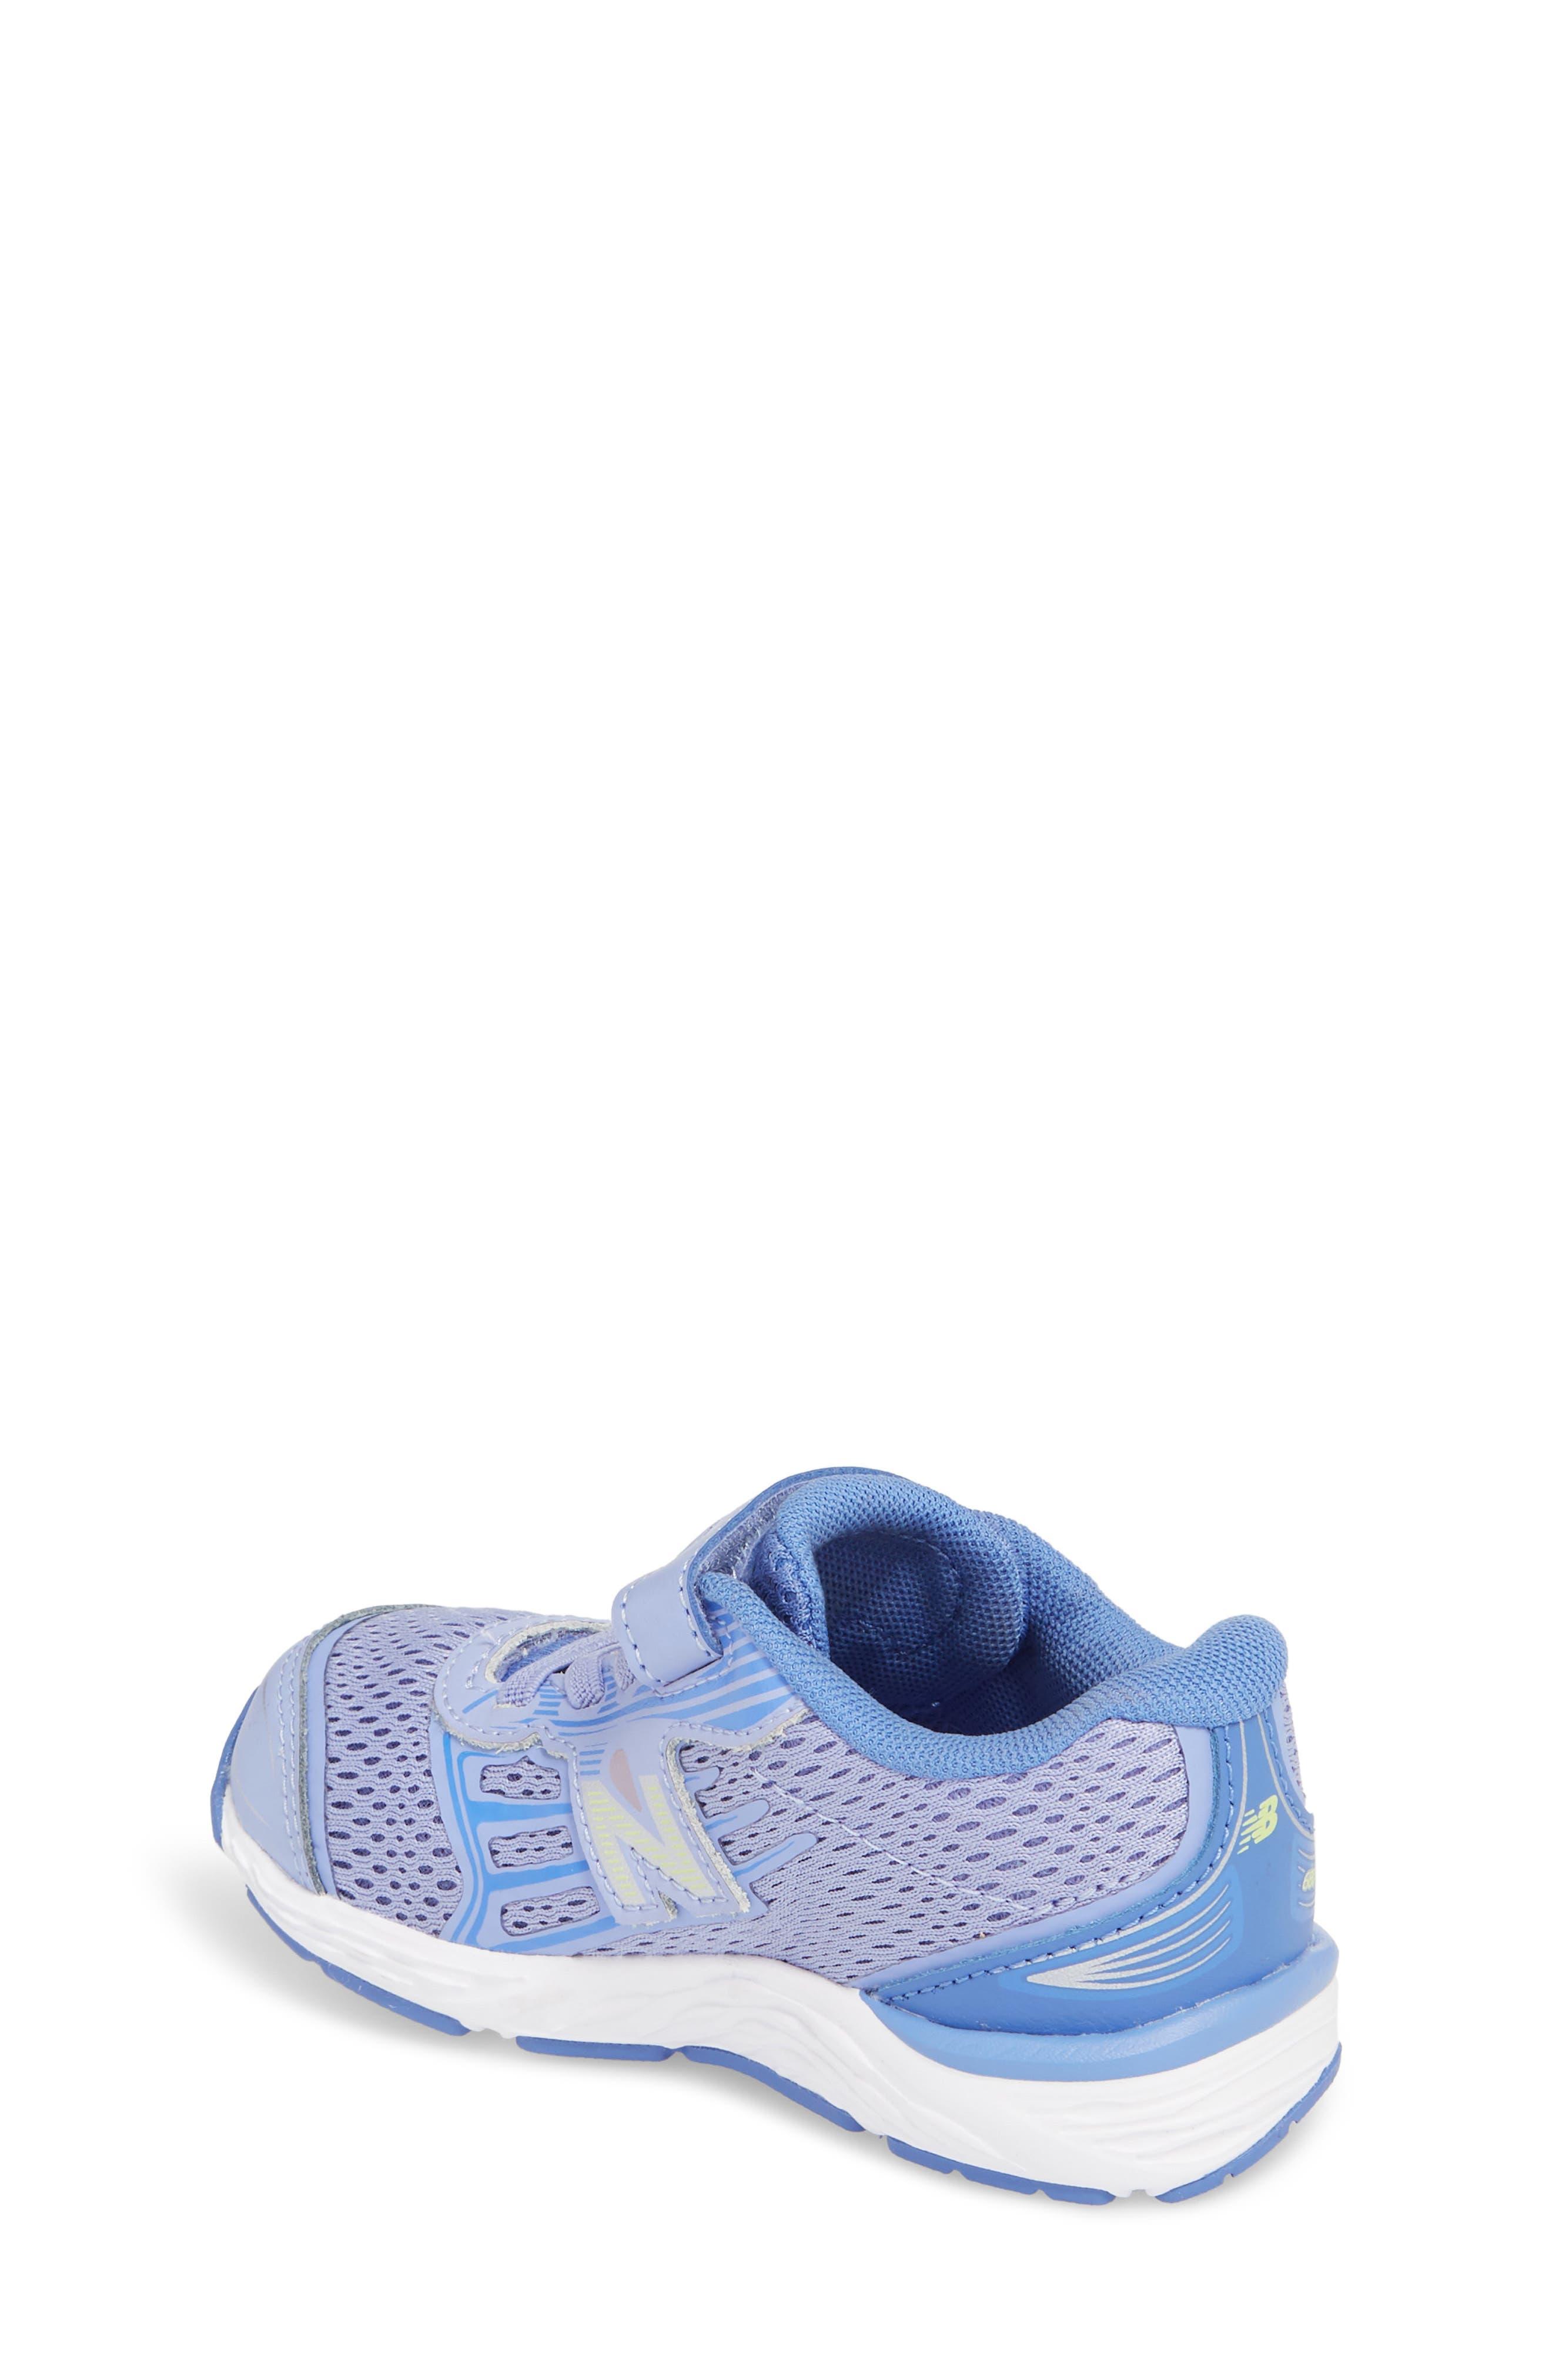 680v5 Sneaker,                             Alternate thumbnail 2, color,                             ICE VIOLET